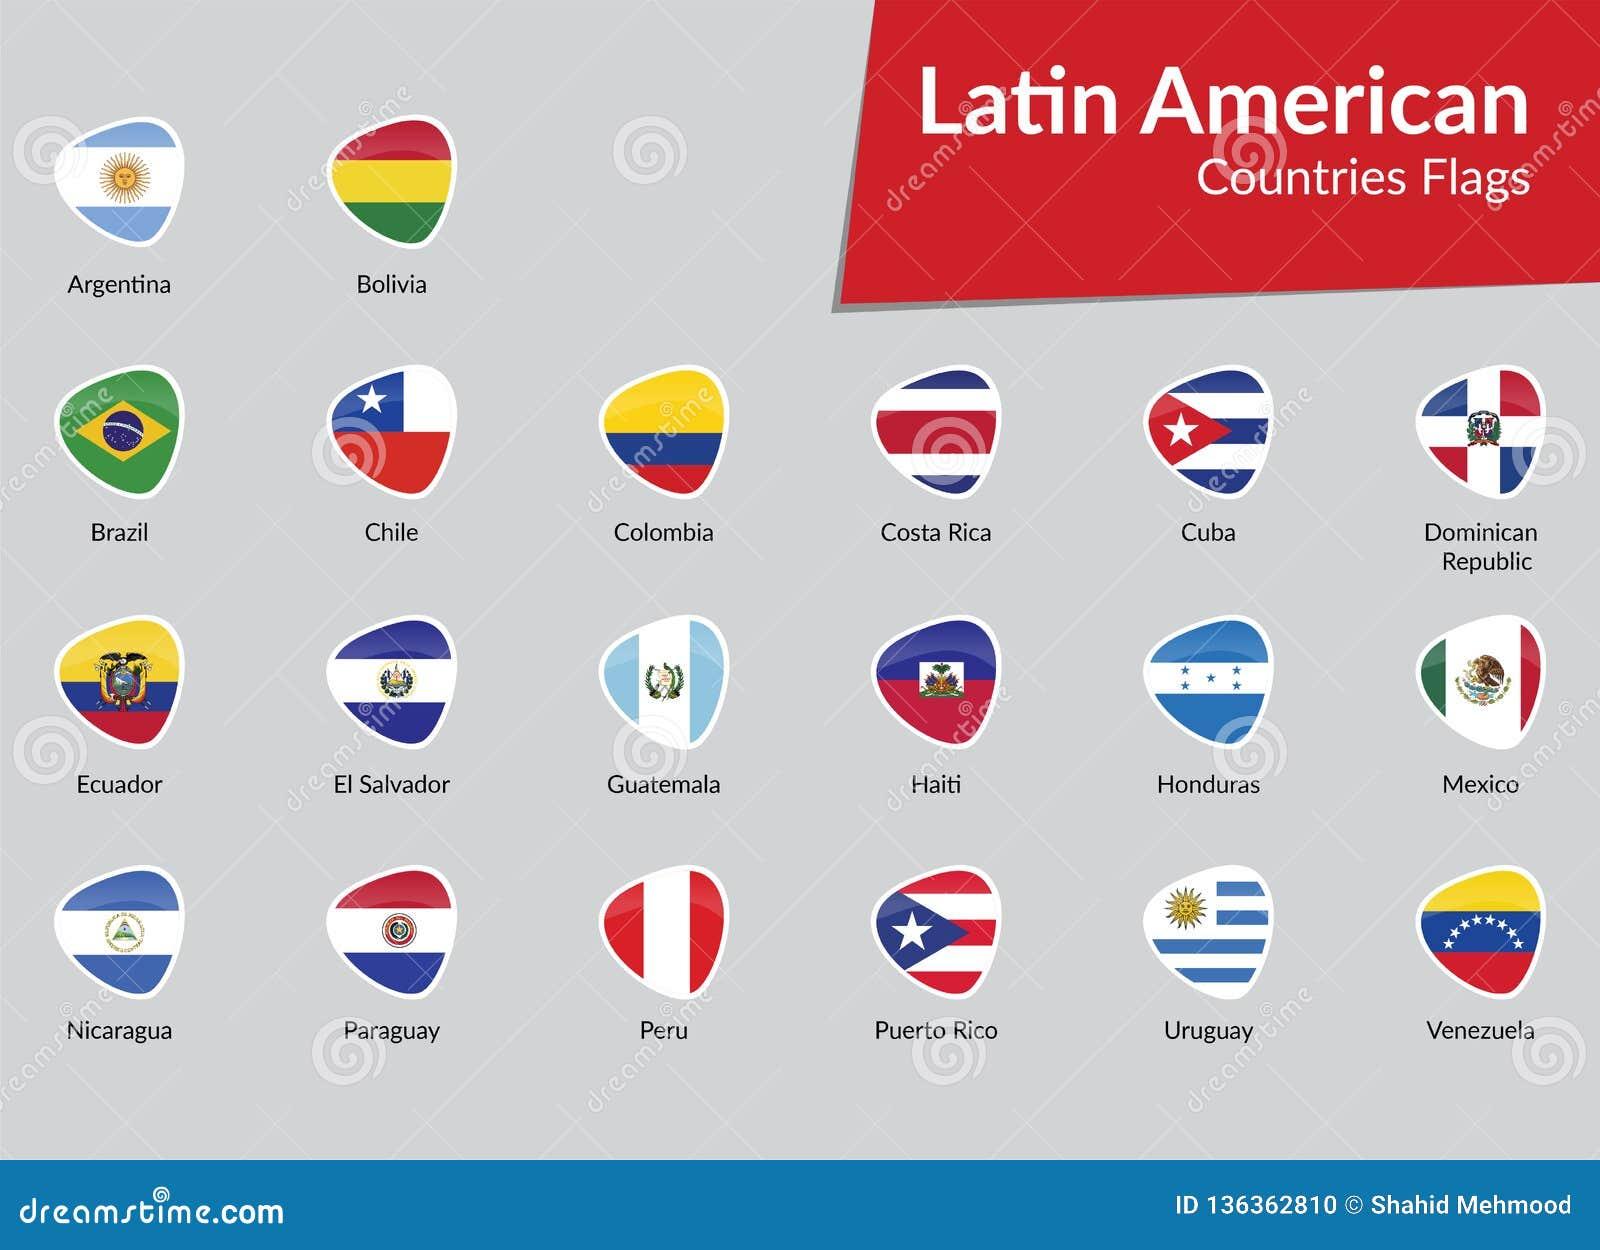 Latin American Flag Icon Stock Illustrations 853 Latin American Flag Icon Stock Illustrations Vectors Clipart Dreamstime